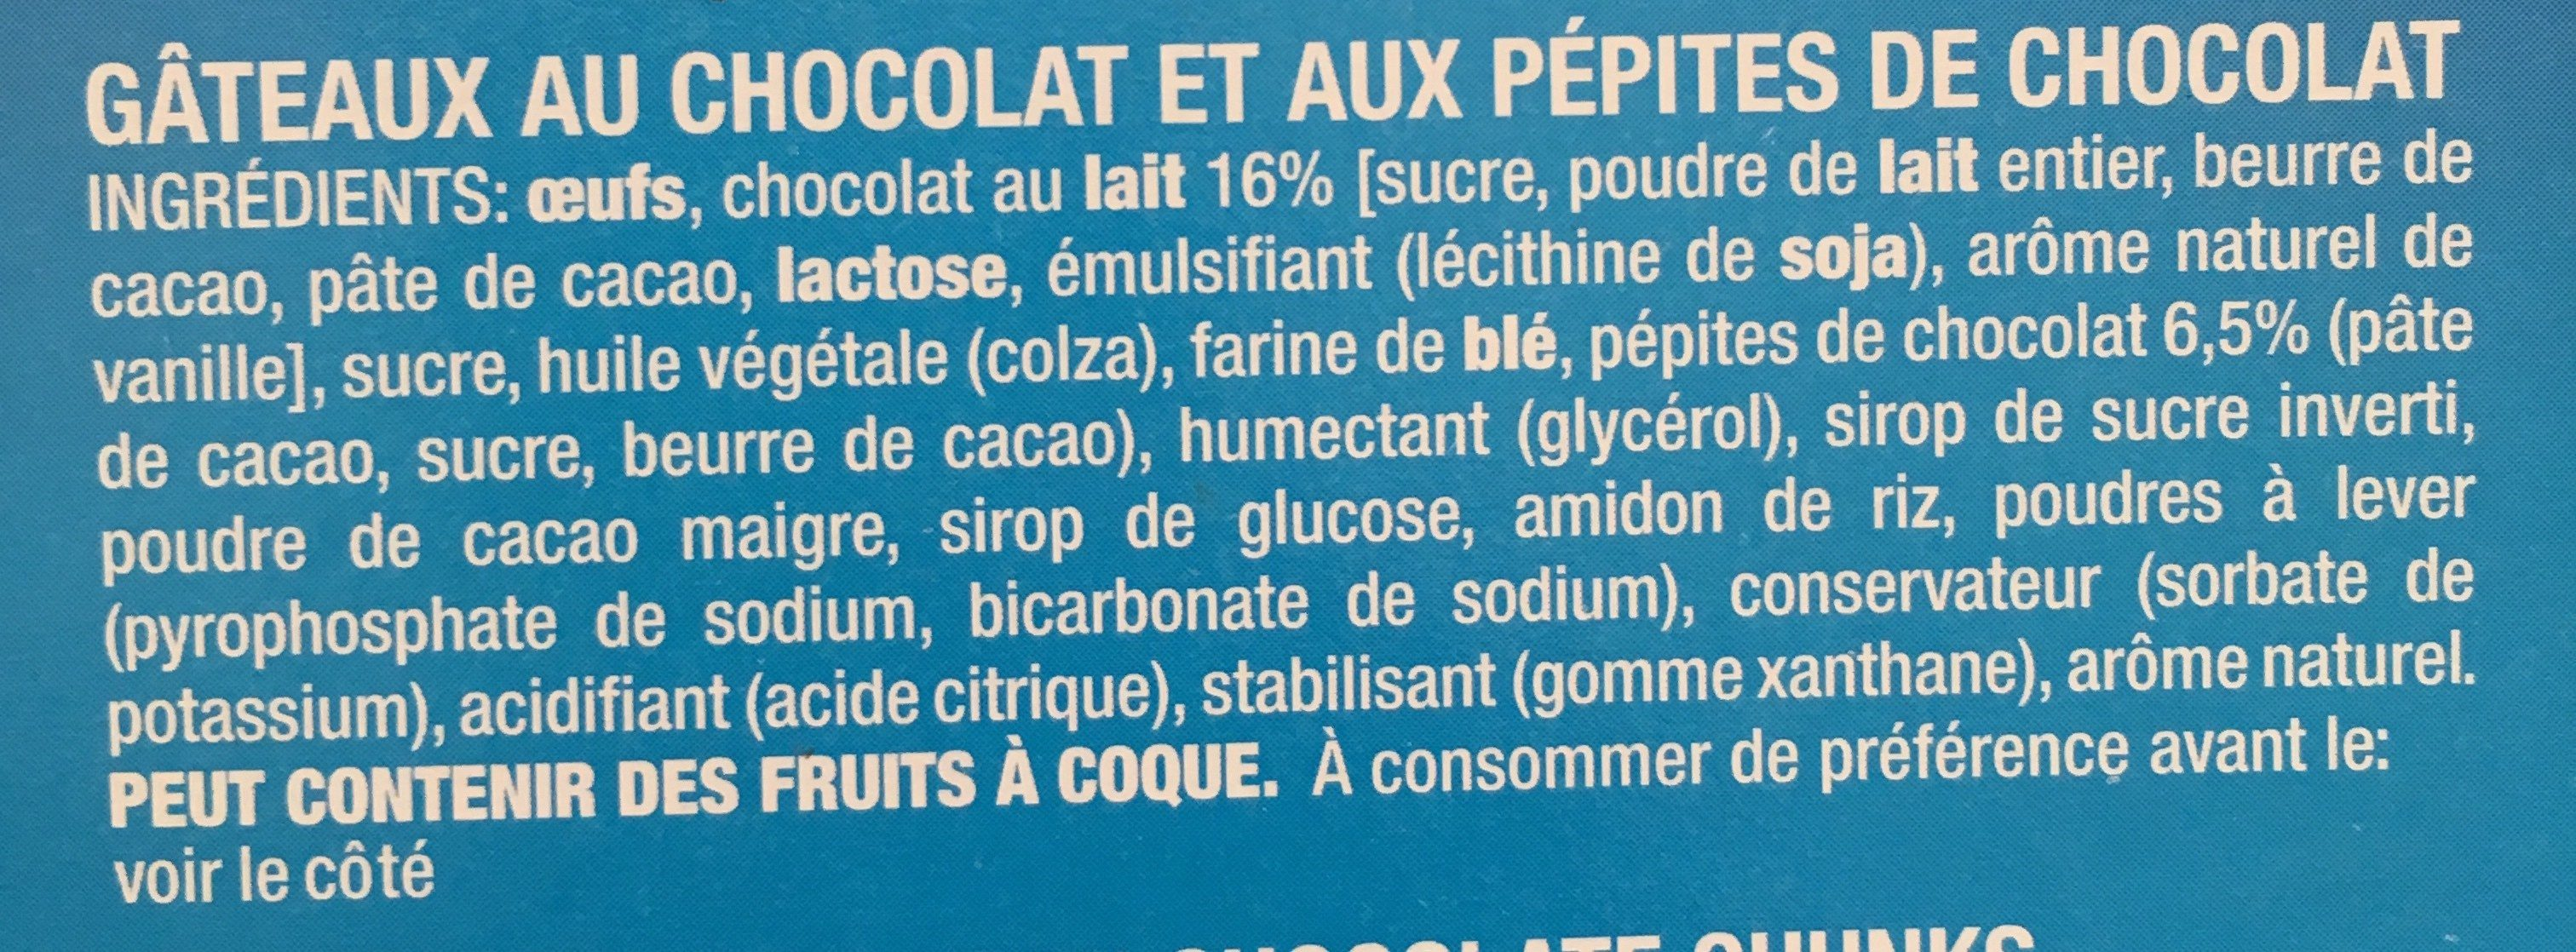 Brownies Double Choc - Ingrediënten - fr